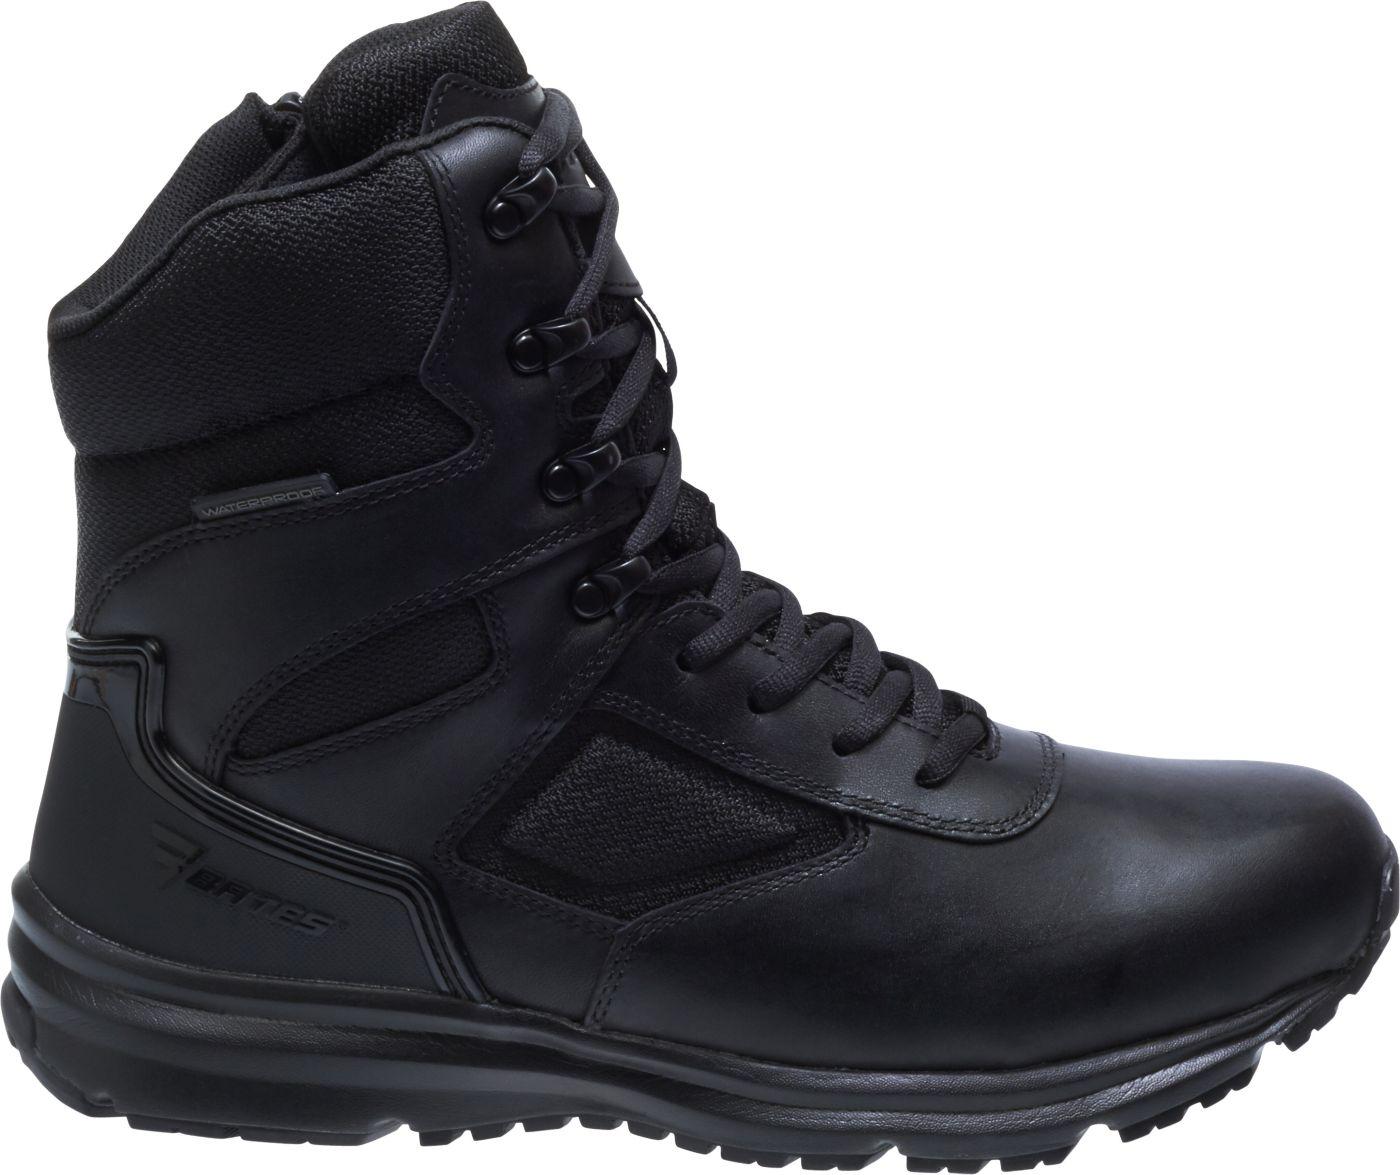 Bates Men's Raide Waterproof Side Zip Work Boots